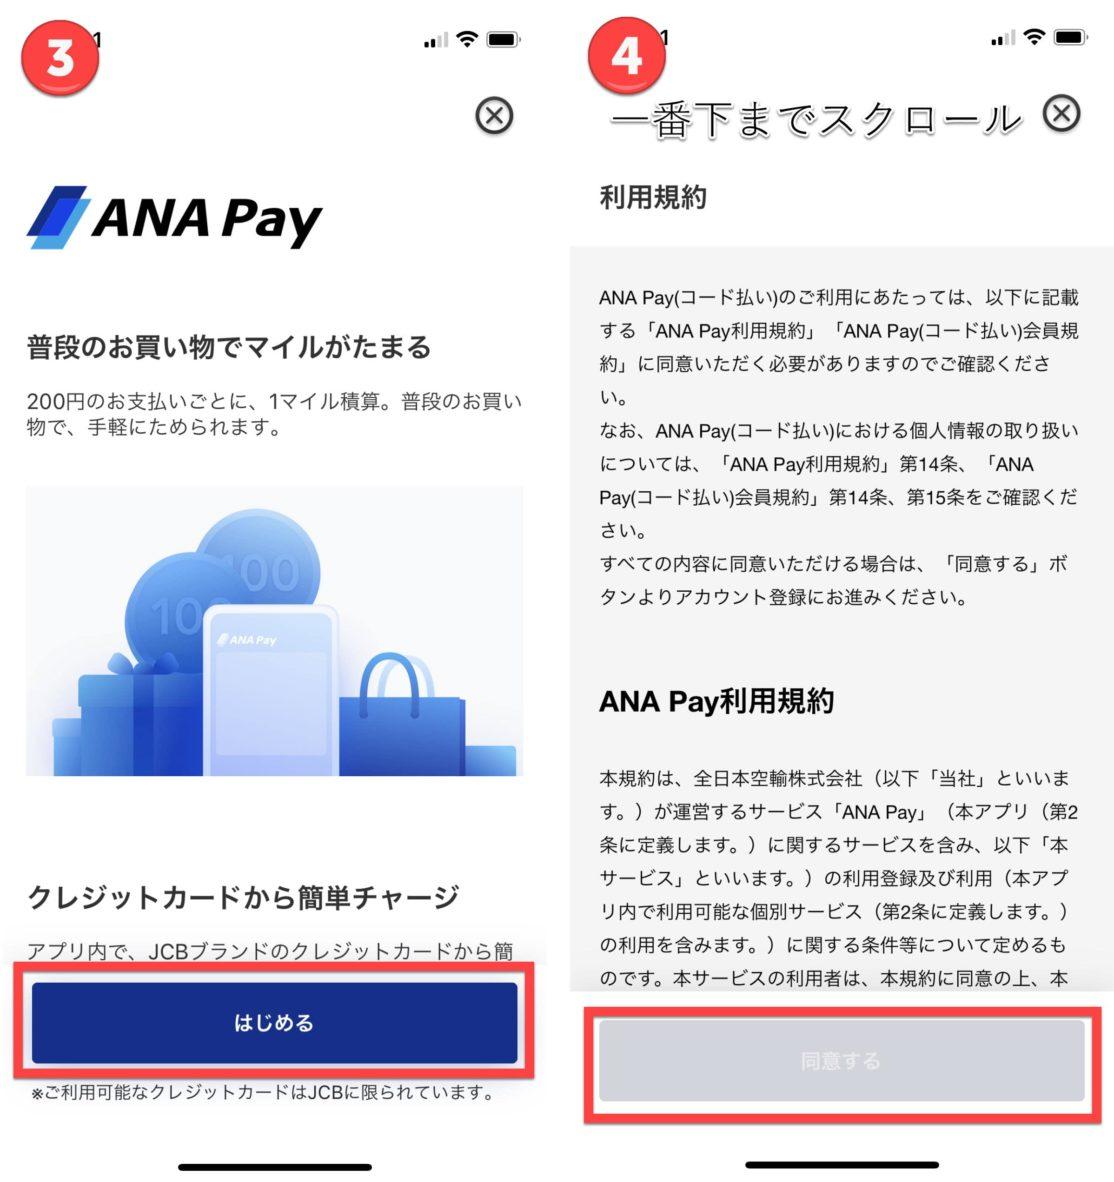 ANA Pay手順2